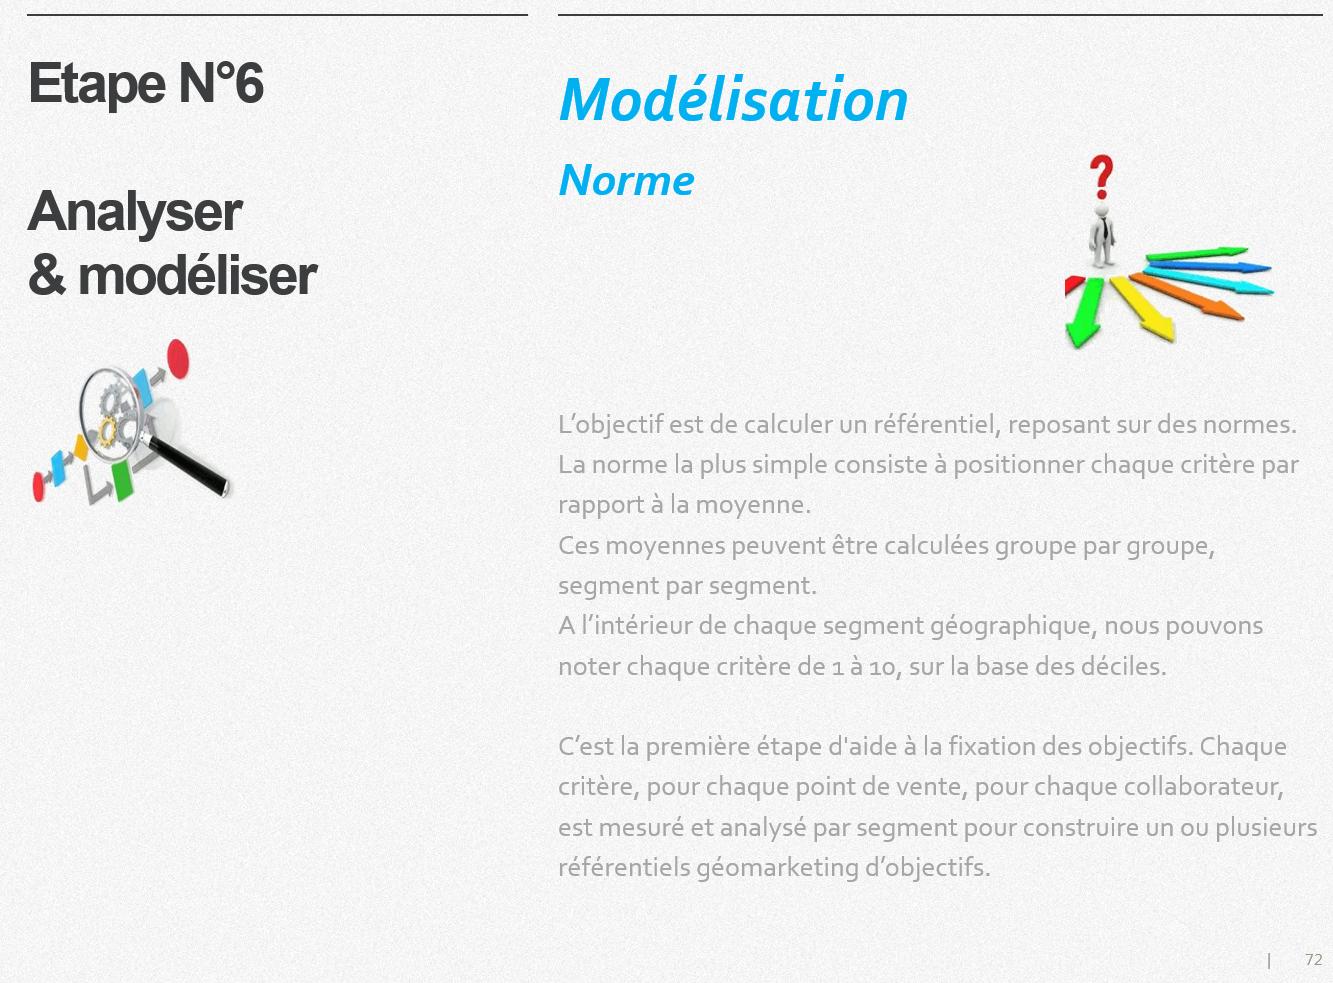 GMKT Slidedoc P72 7 etapes AnaMod6